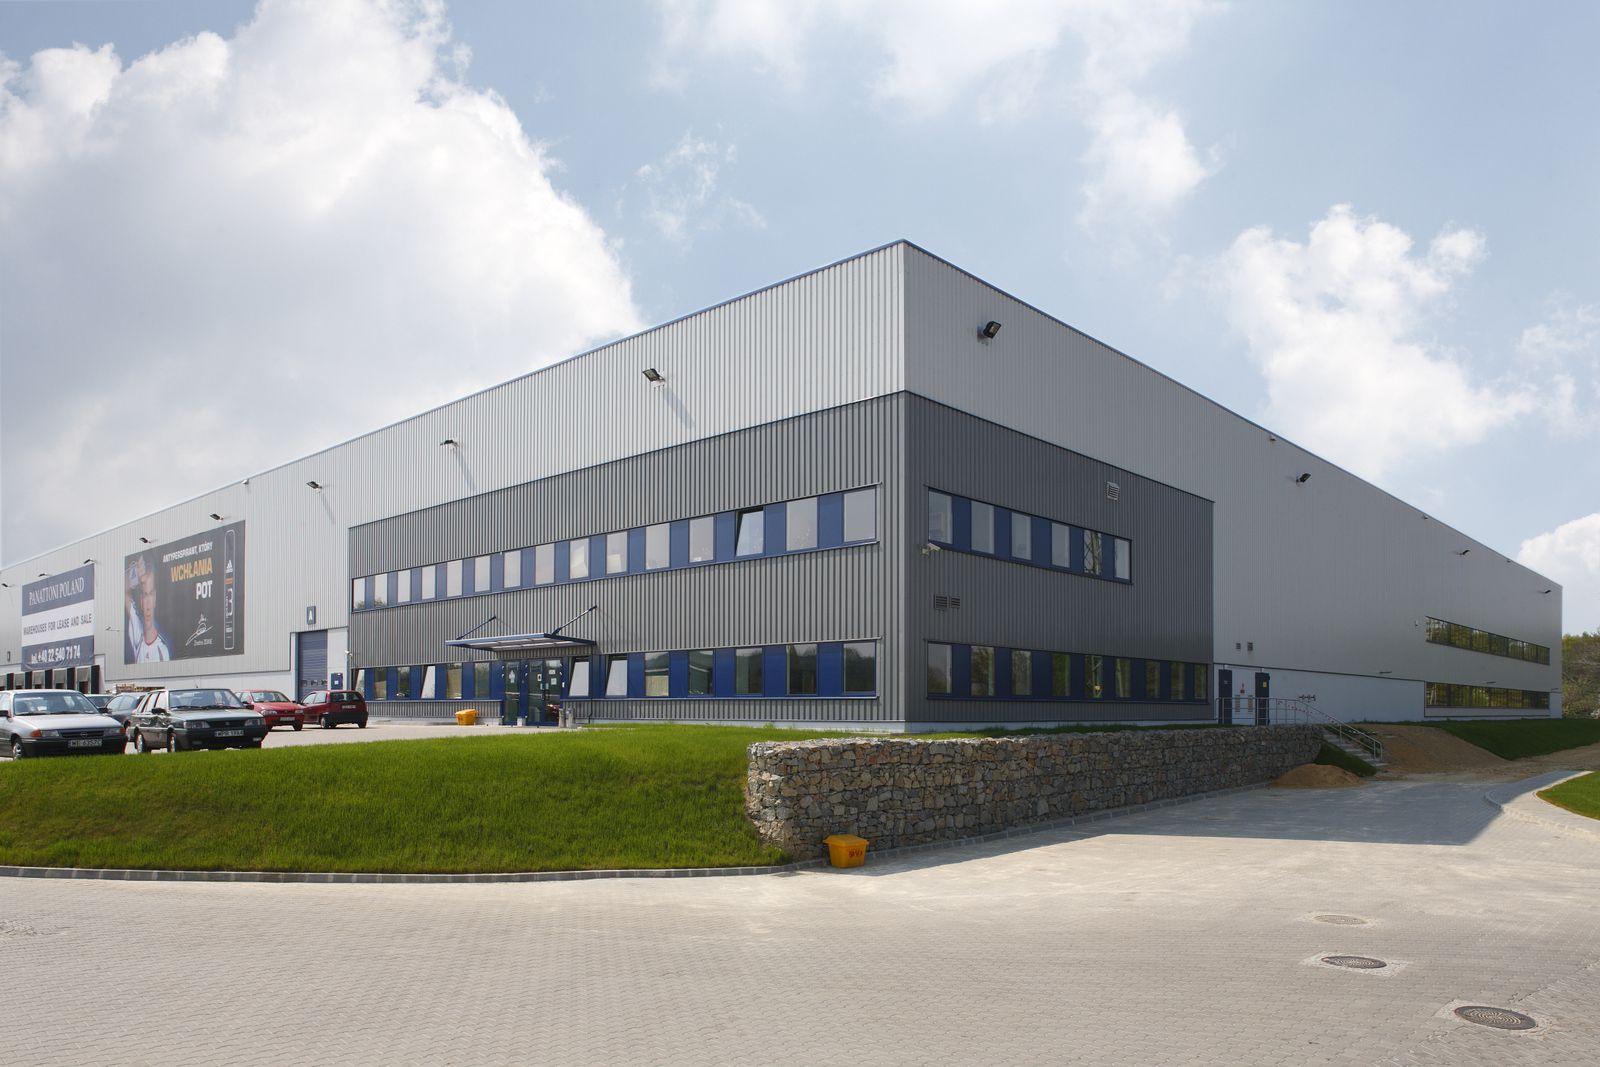 Panattoni park bielsko bia a parki magazynowe w polsce pinterest factory architecture for Industrial warehouse exterior design